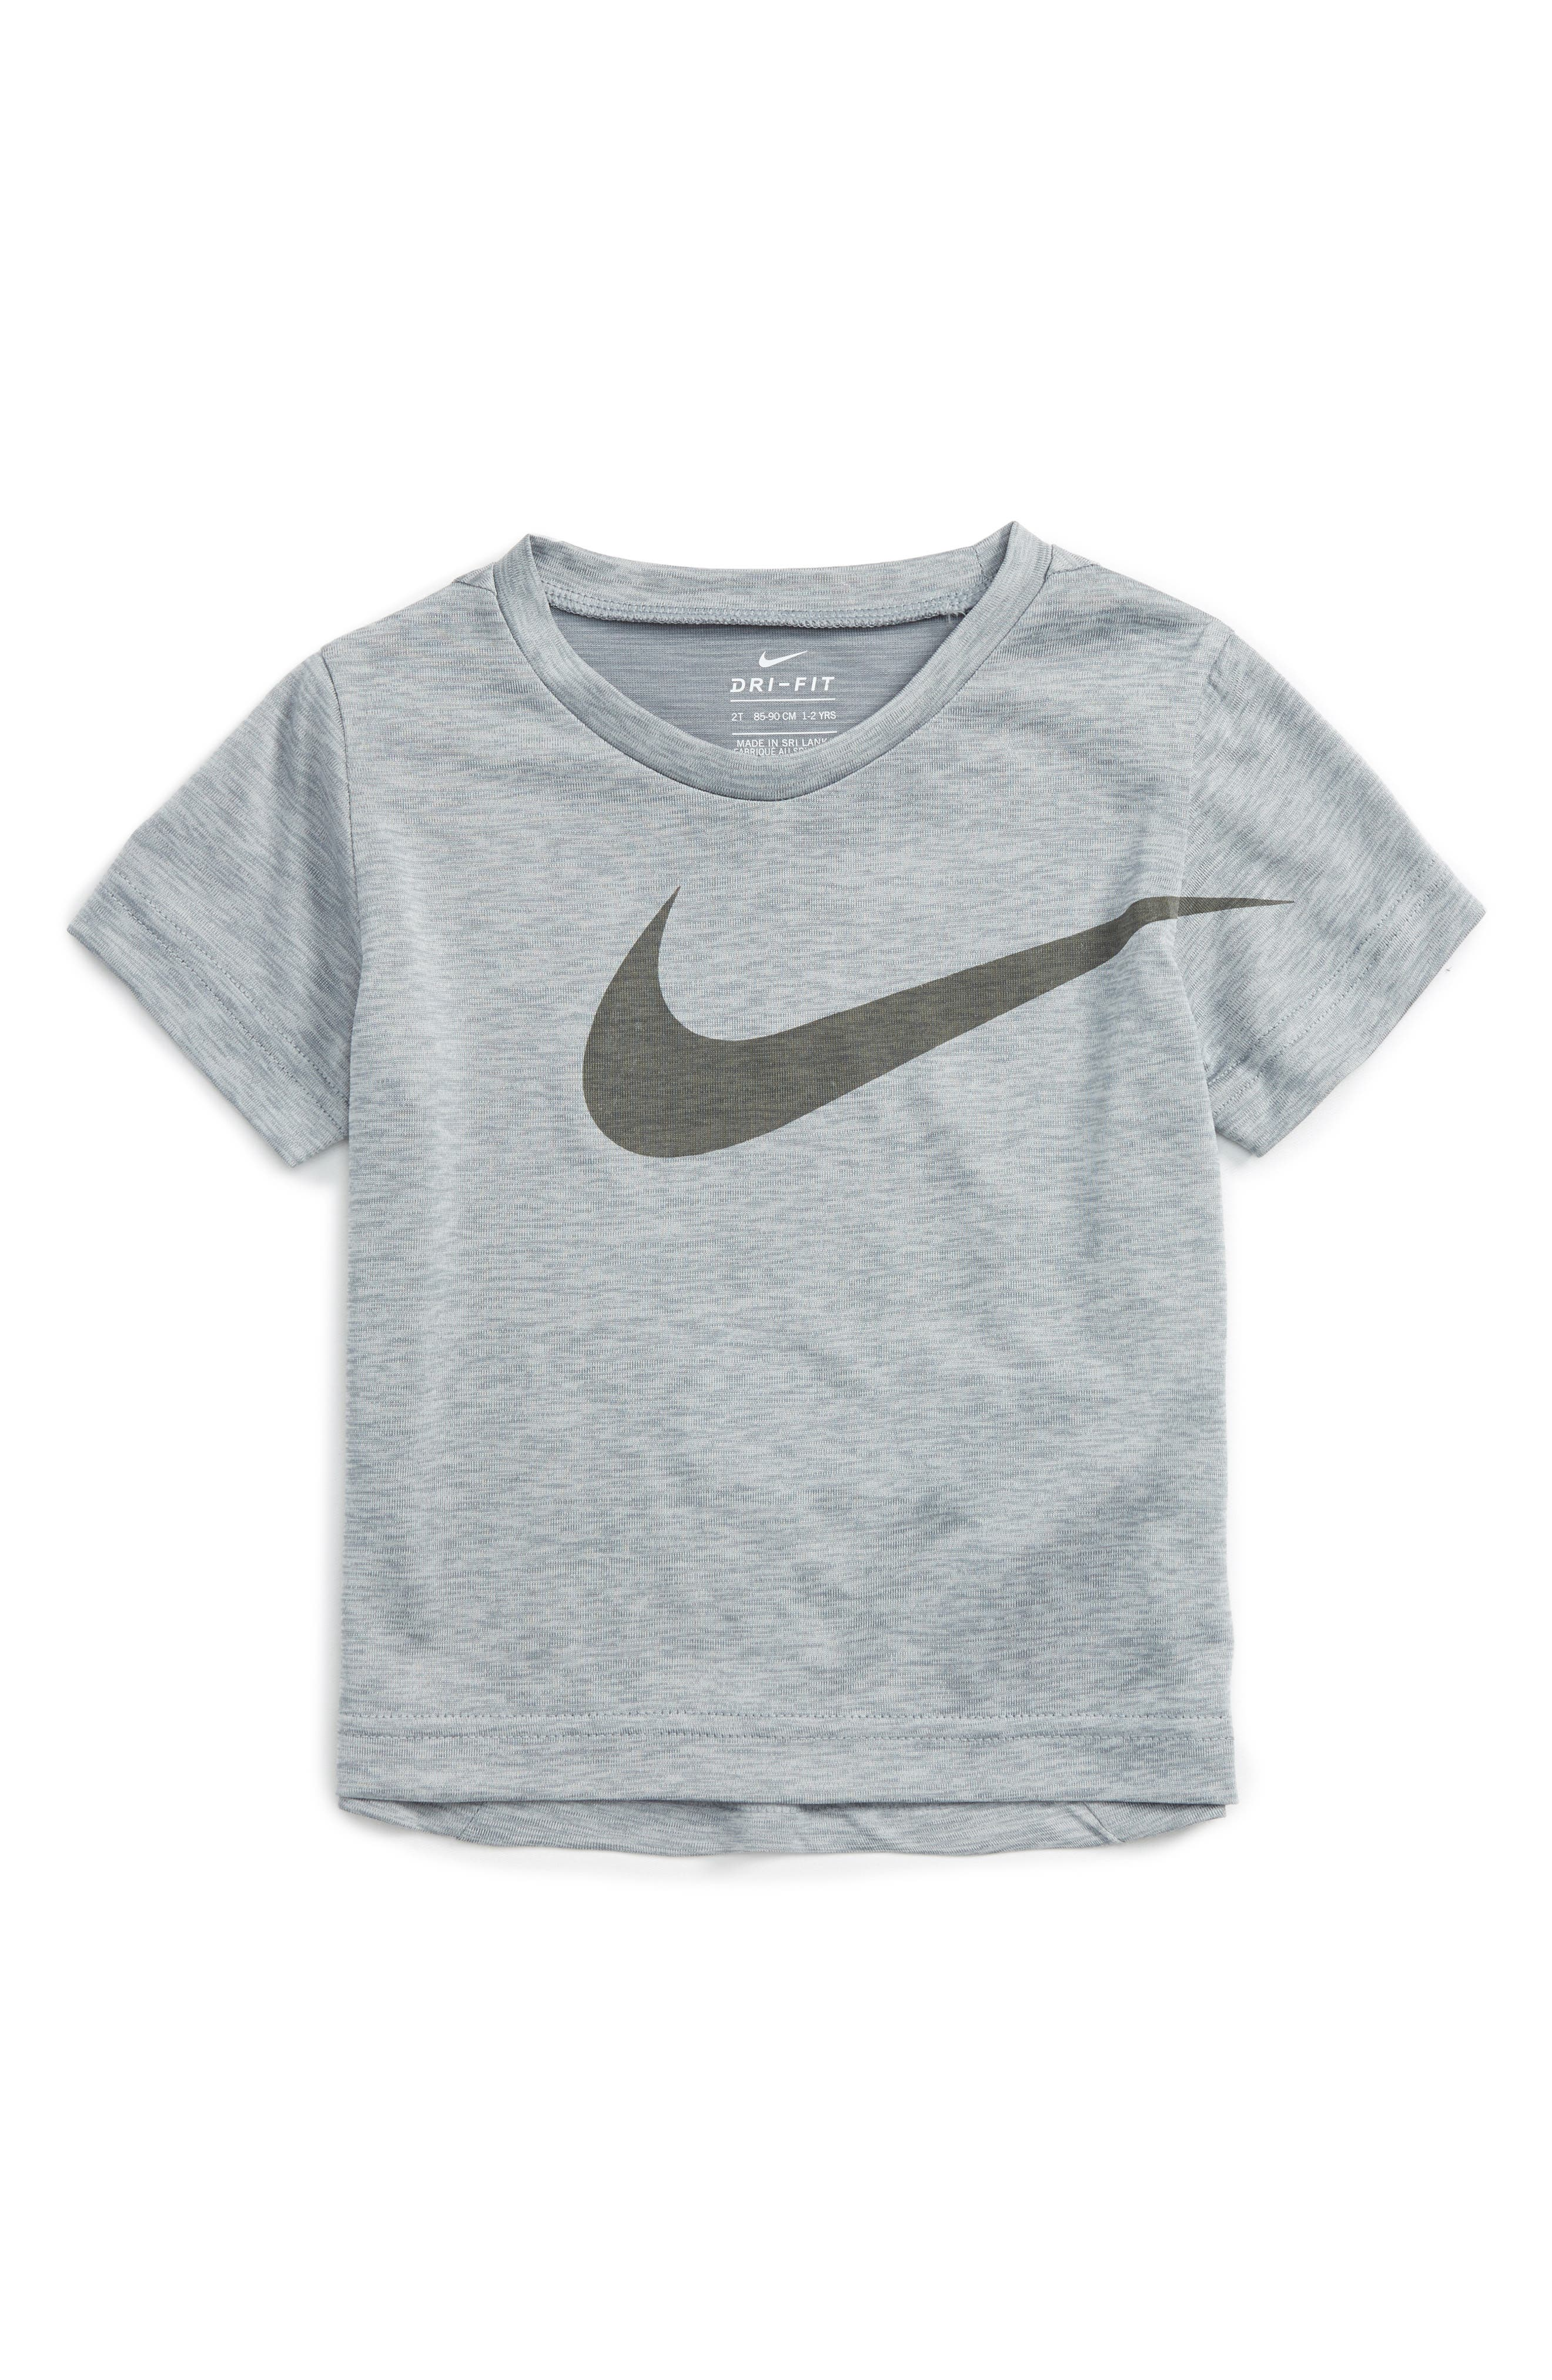 Dri-FIT T-Shirt,                         Main,                         color, Metallic Silver